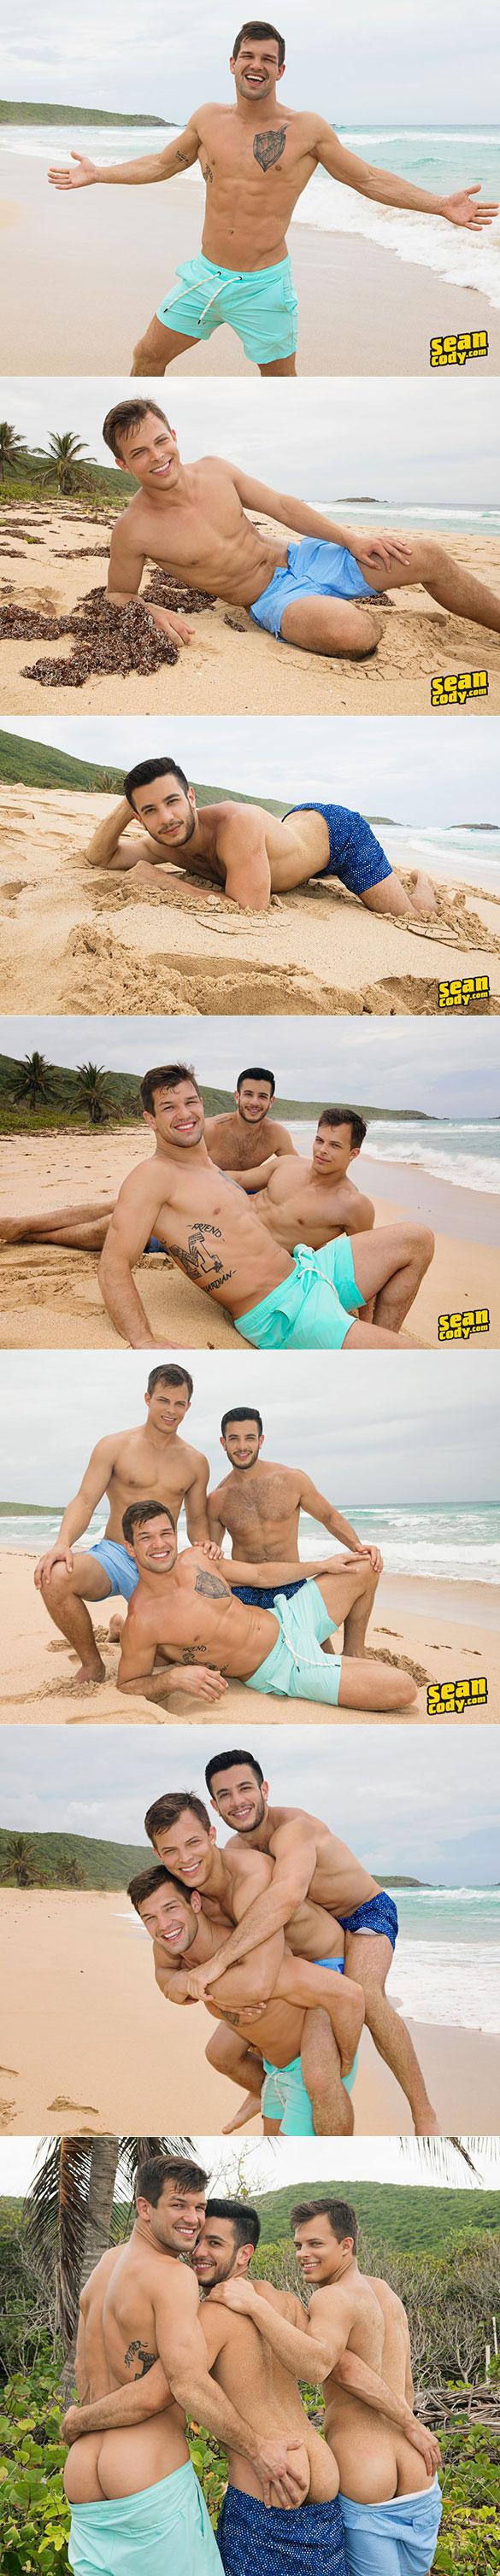 "Sean Cody: Brysen, Daniel, Jayden and Manny's wild and raw fourway in ""Puerto Rican Getaway, Day 4"""